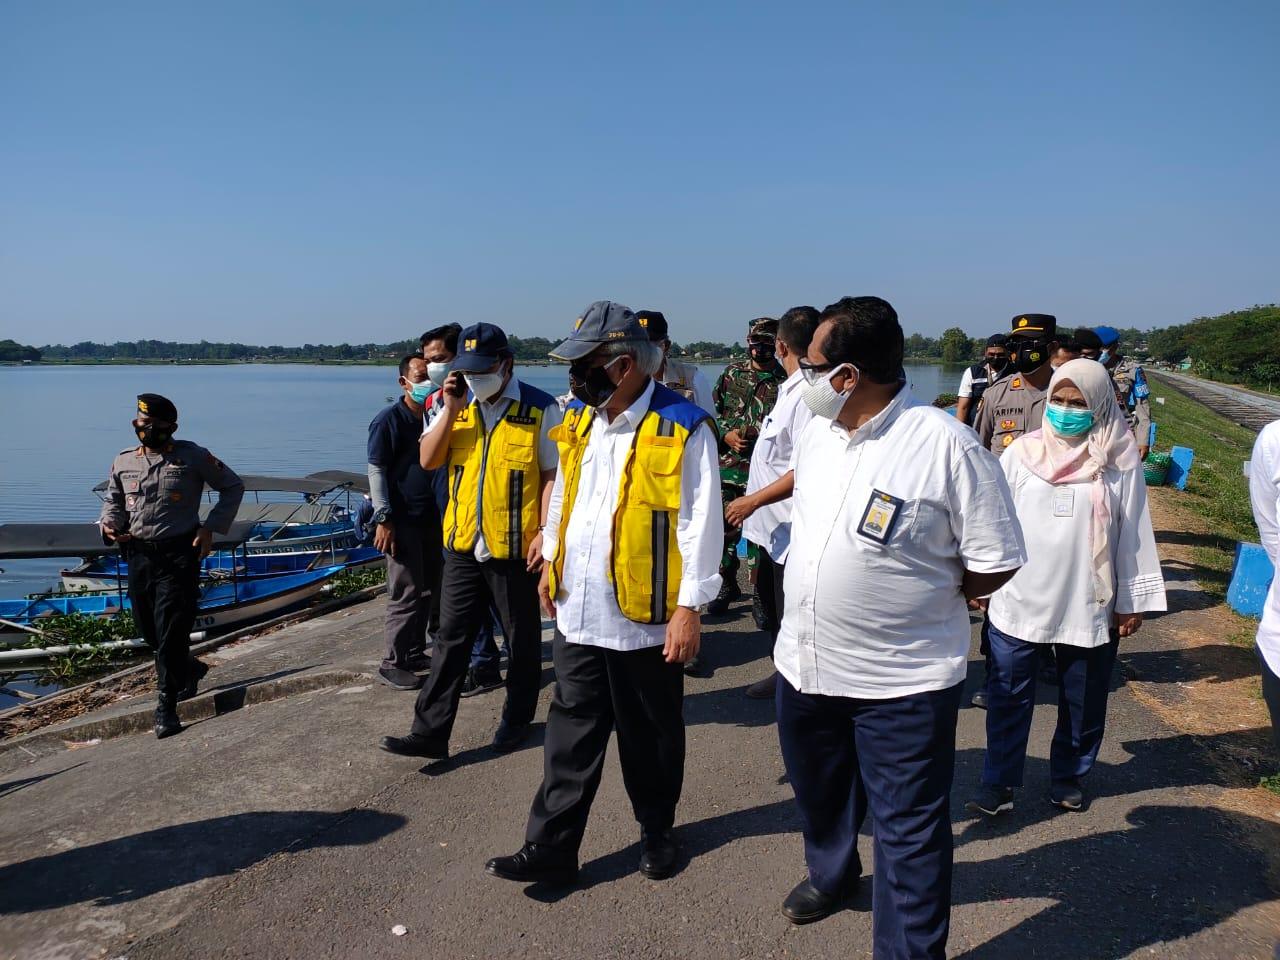 Menteri PUPR Meninjau Infrastruktur Bendungan di Wilayah Sungai Bengawan Solo